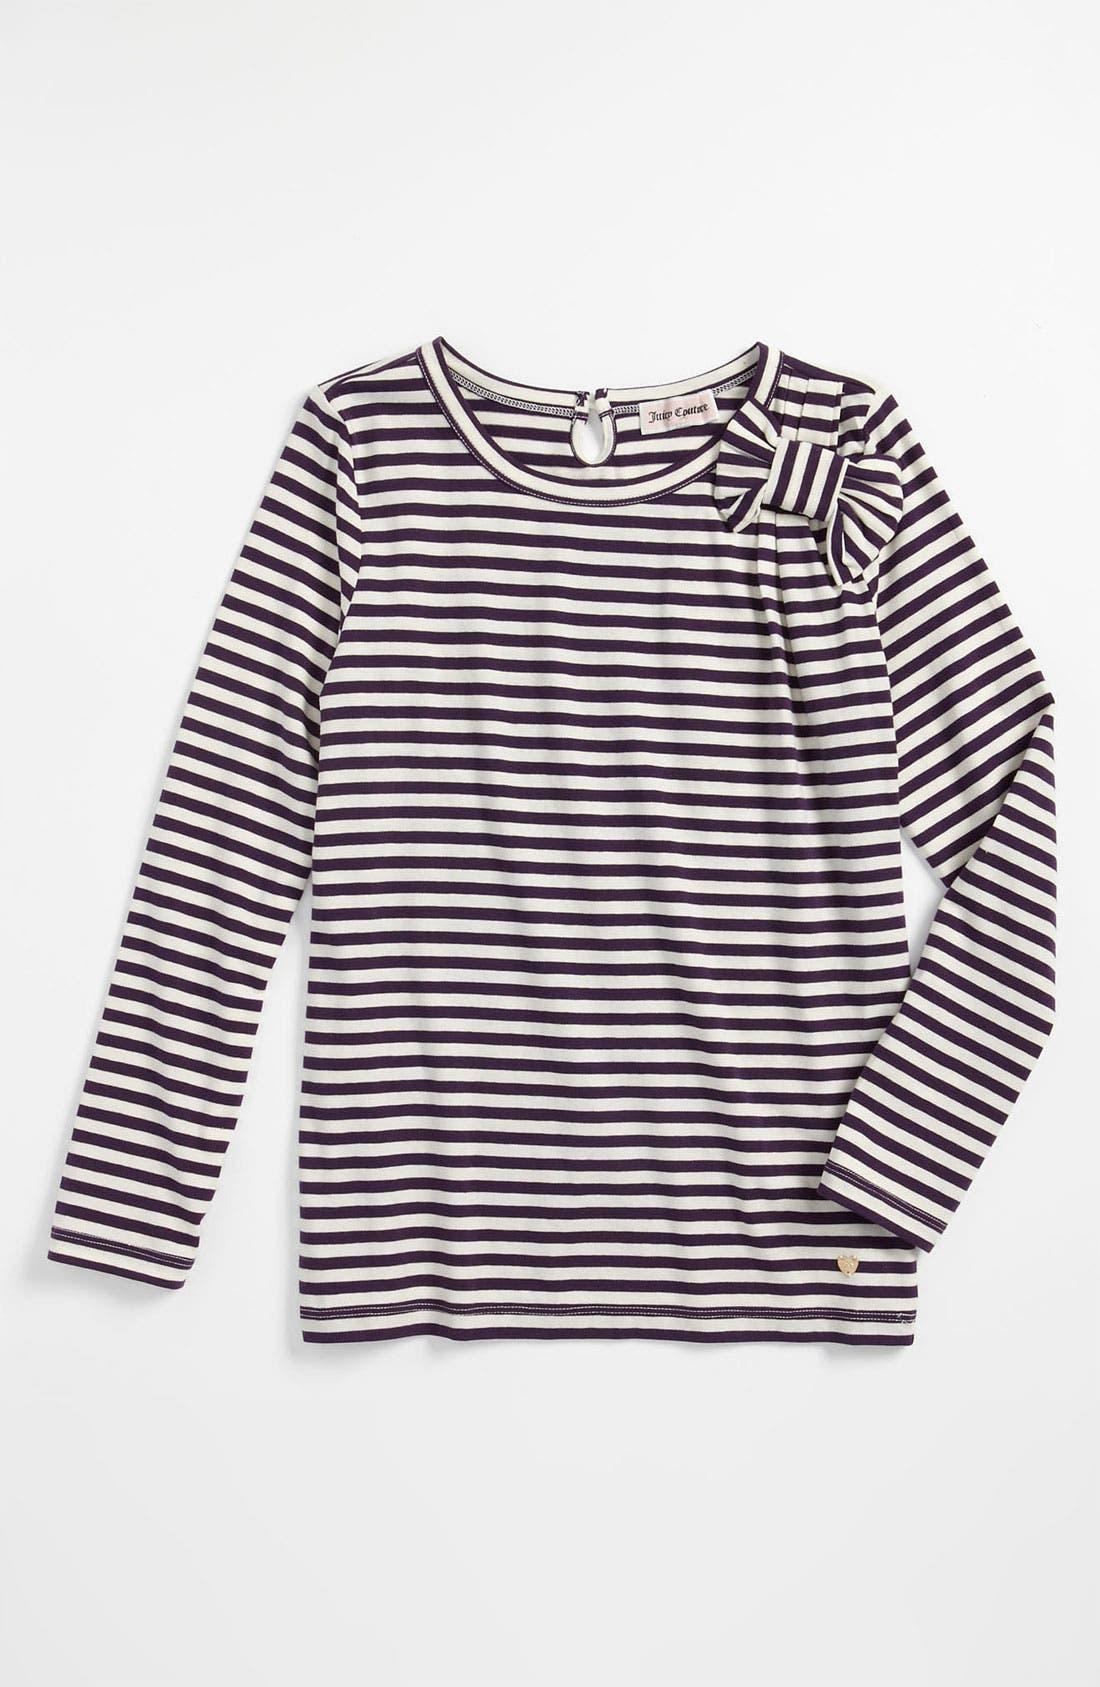 Main Image - Juicy Couture Stripe Tee (Little Girls & Big Girls)